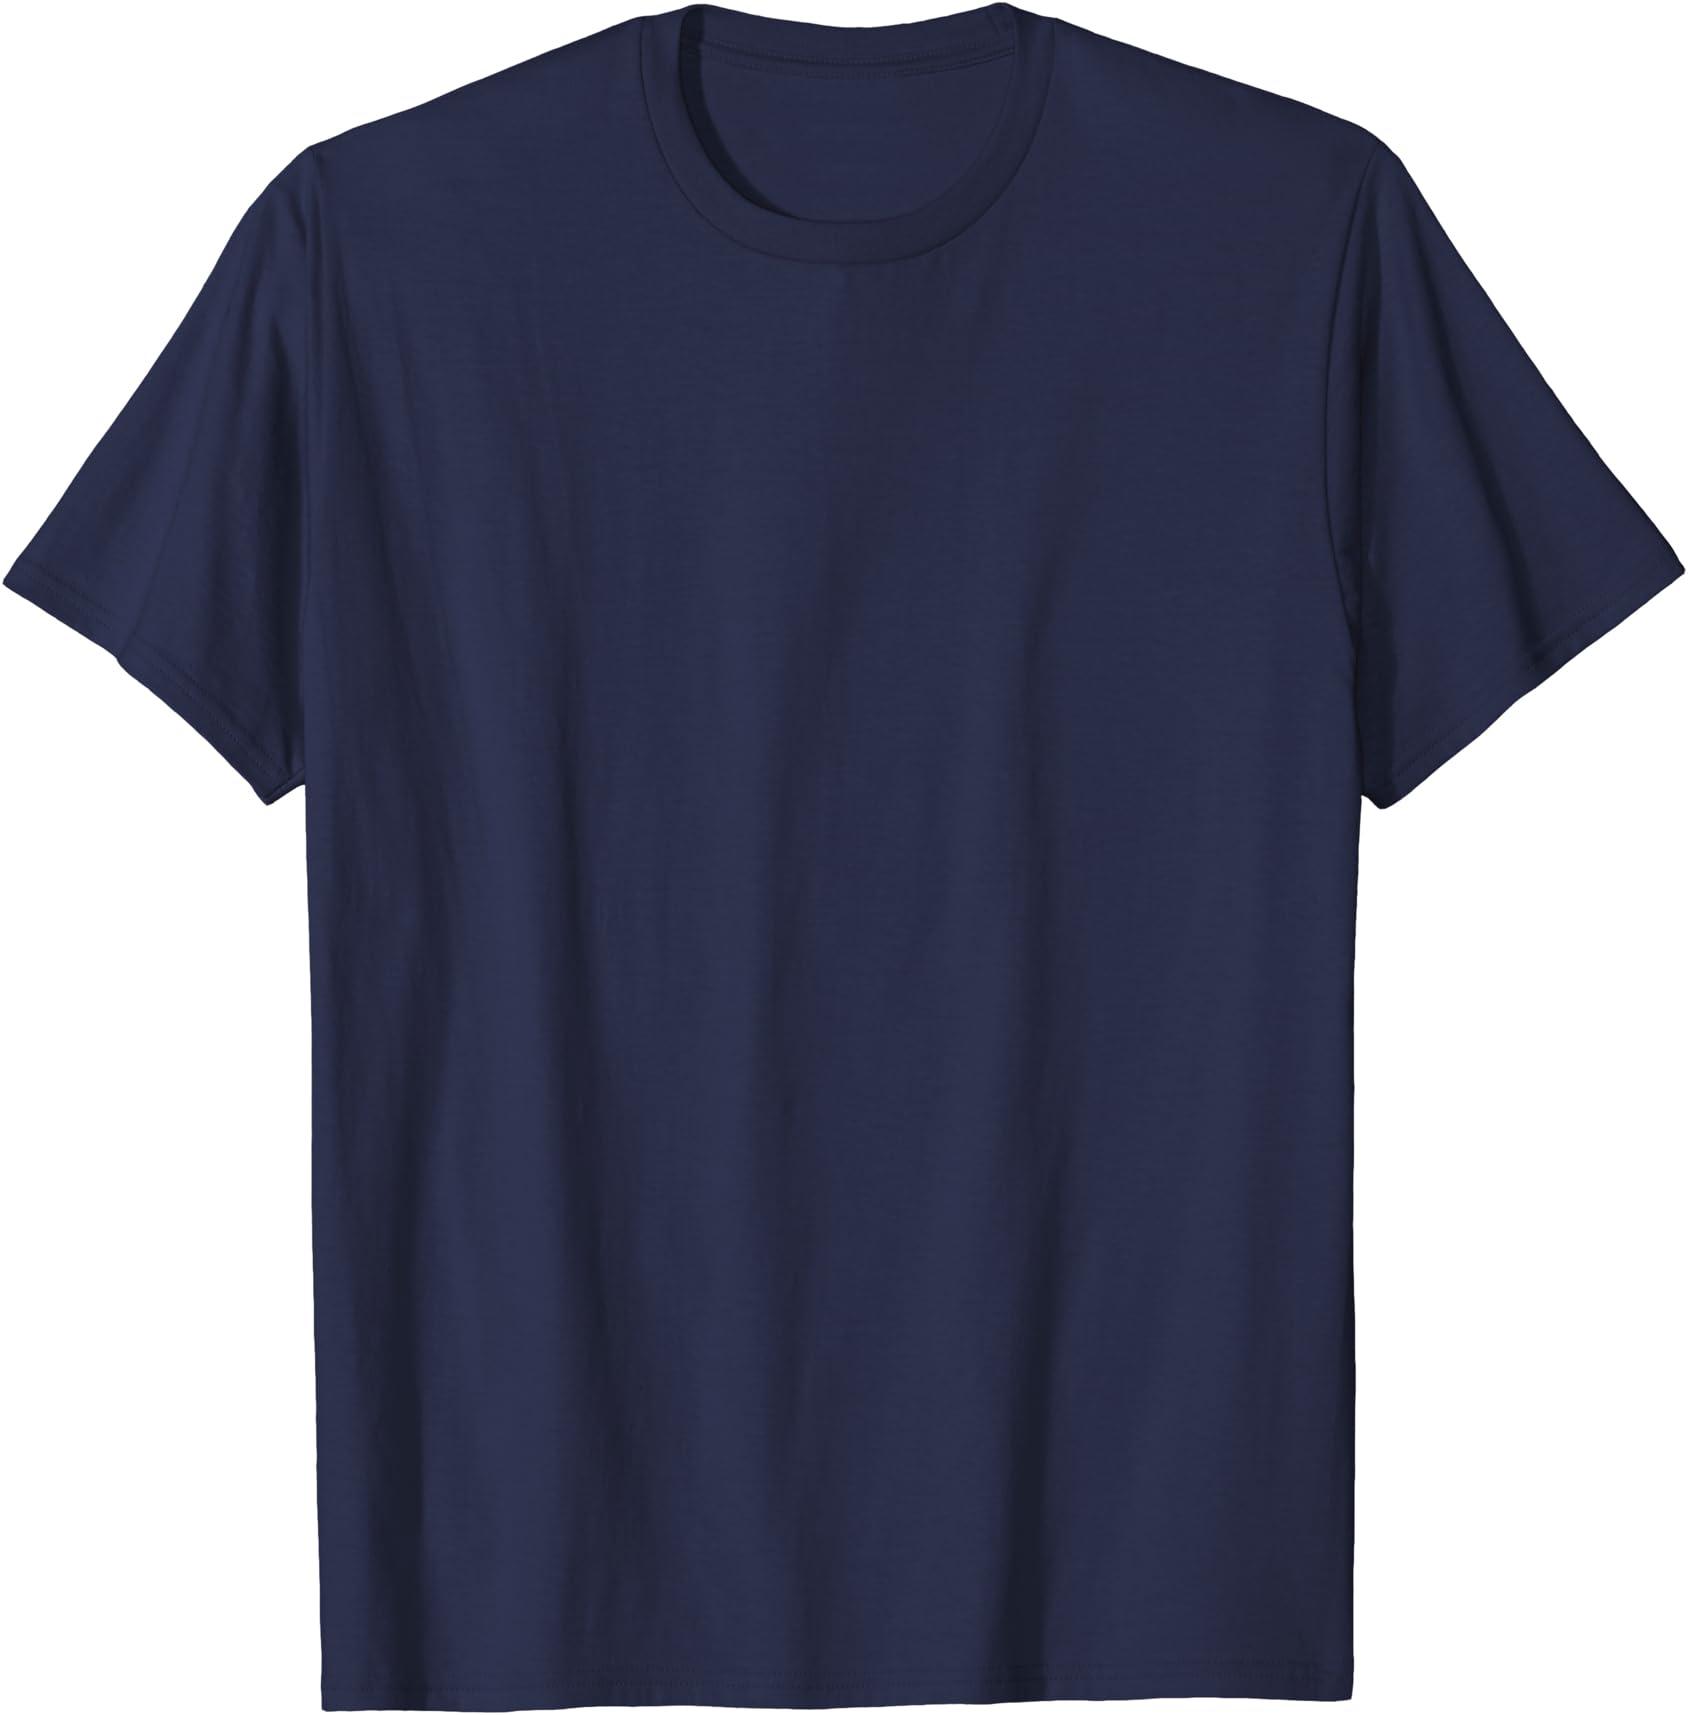 Supergirl Retro Bombshell Womens Girls Navy Blue T Shirt Justice League Official